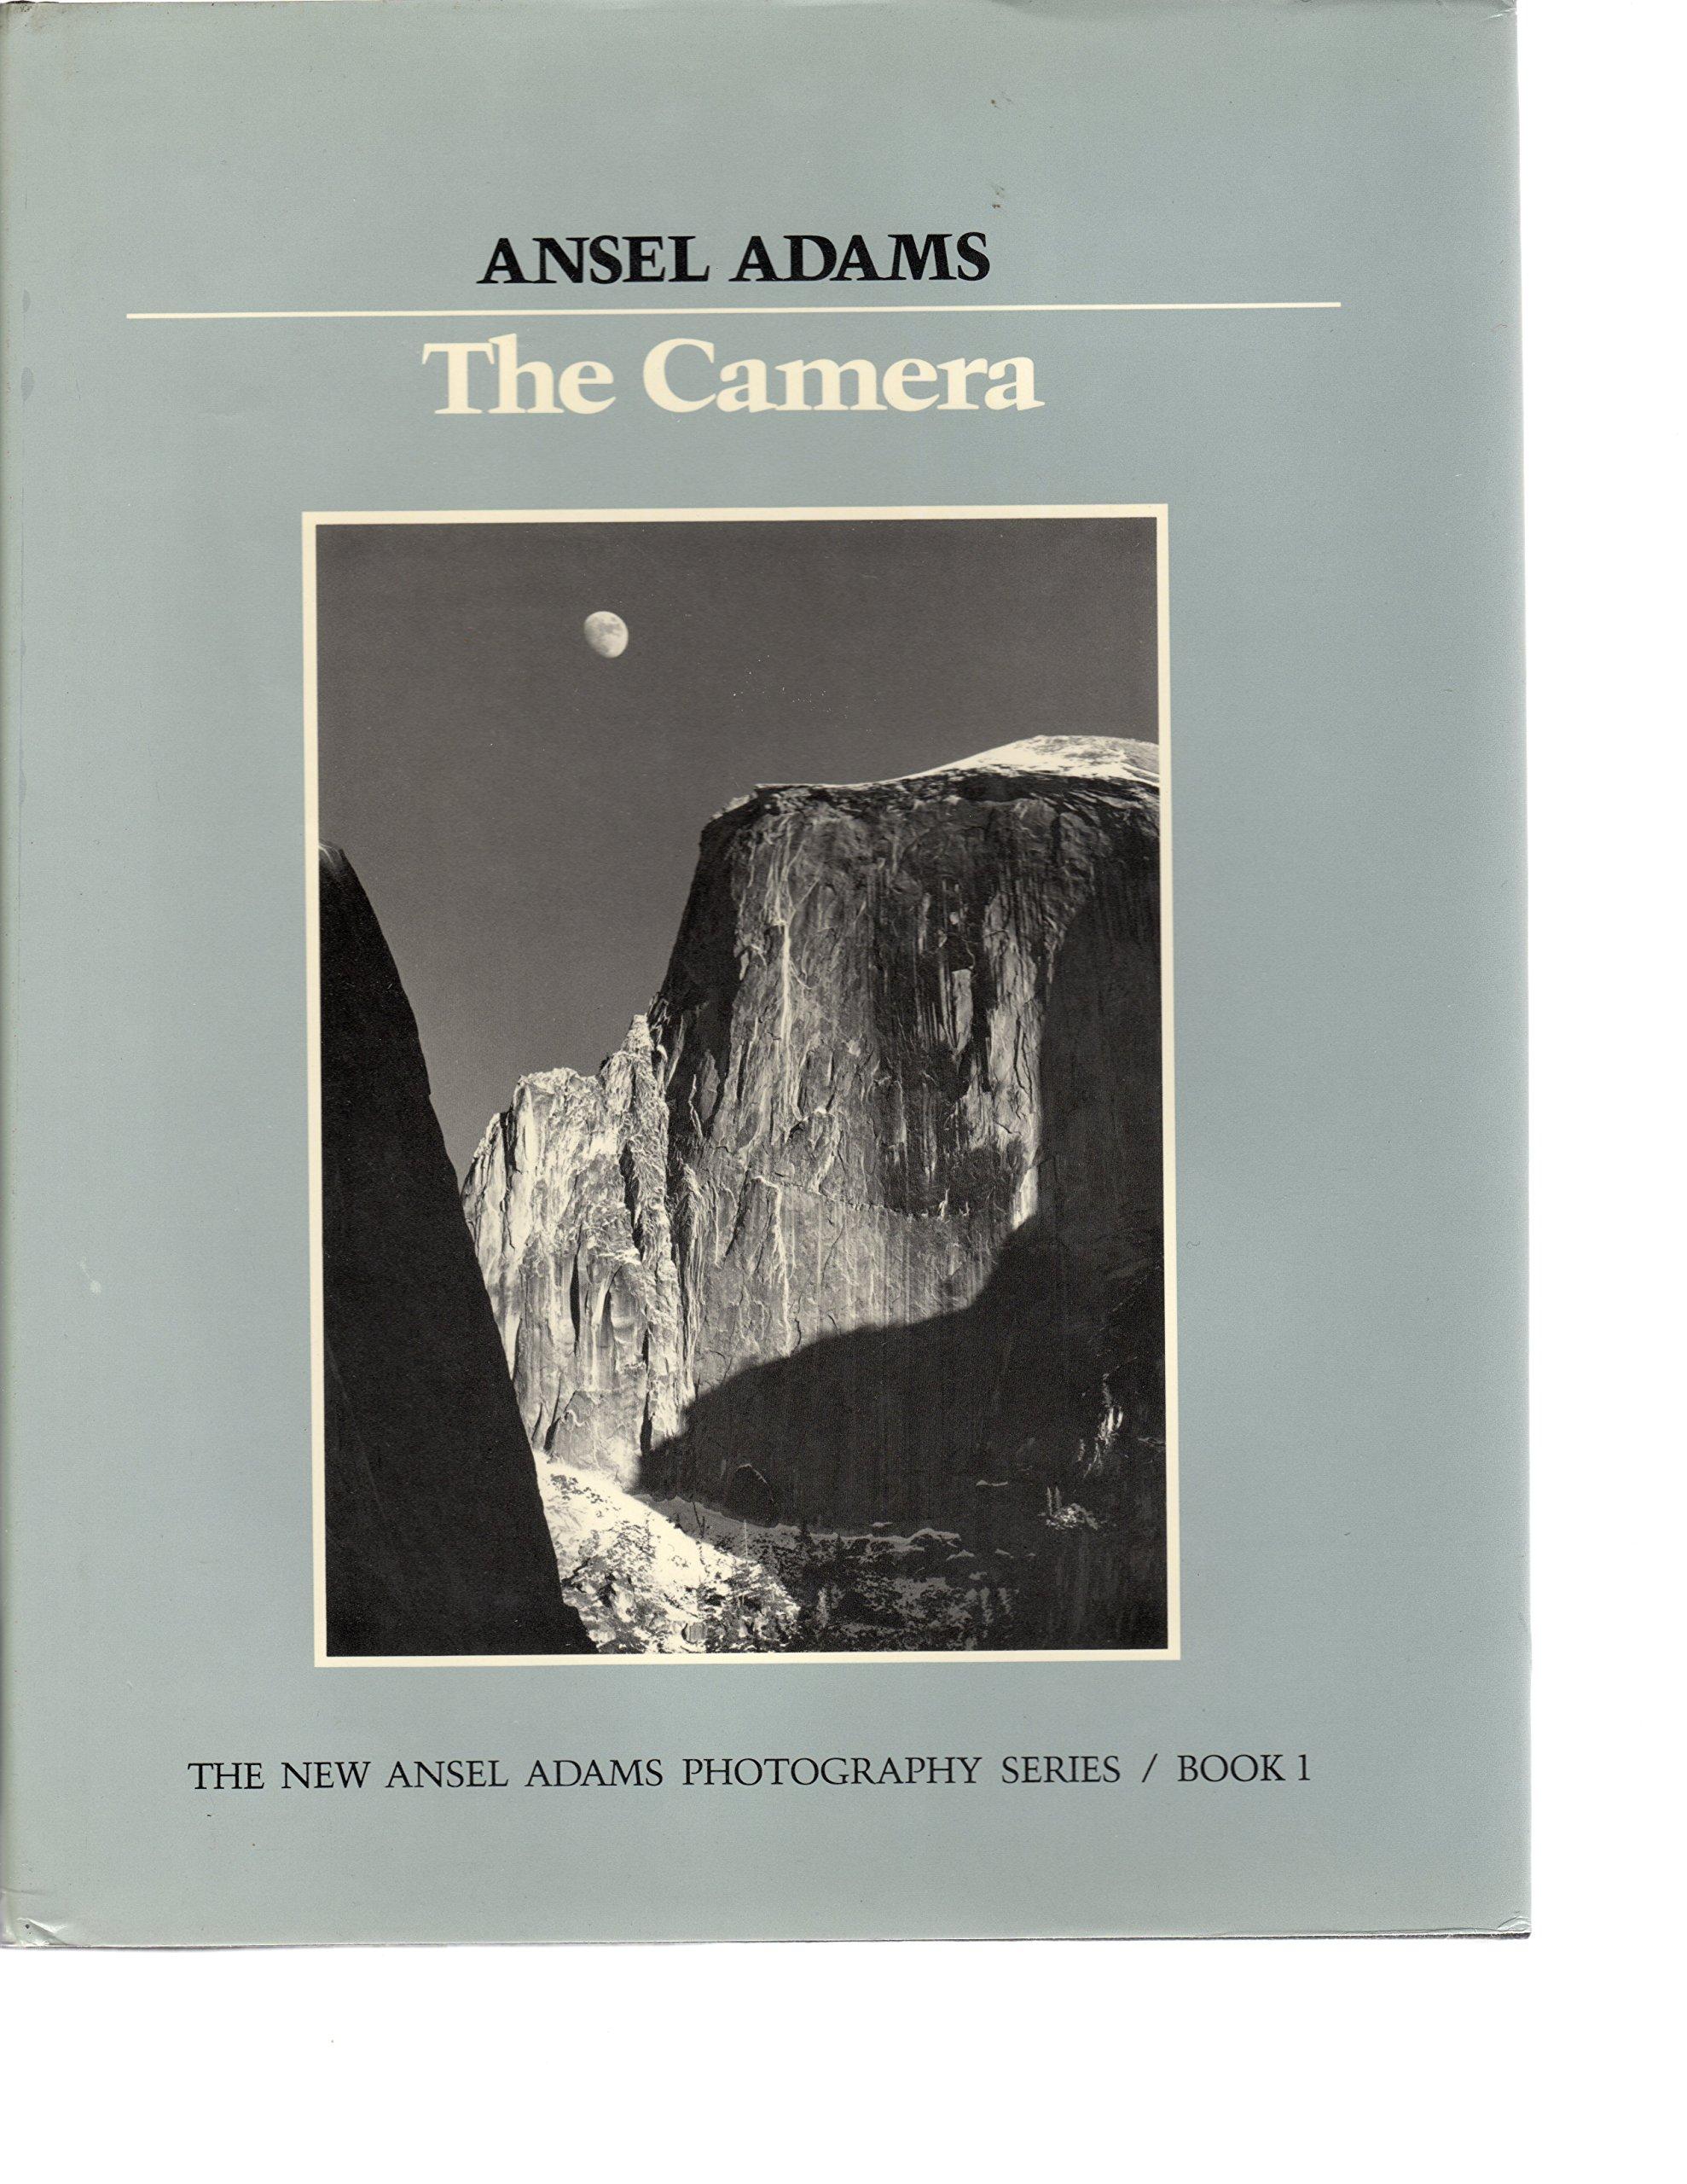 THE CAMERA NEW ANSEL ADAMS PHOTOGRAPHY SERIES BOOK 1 Ansel Adams Amazon Books